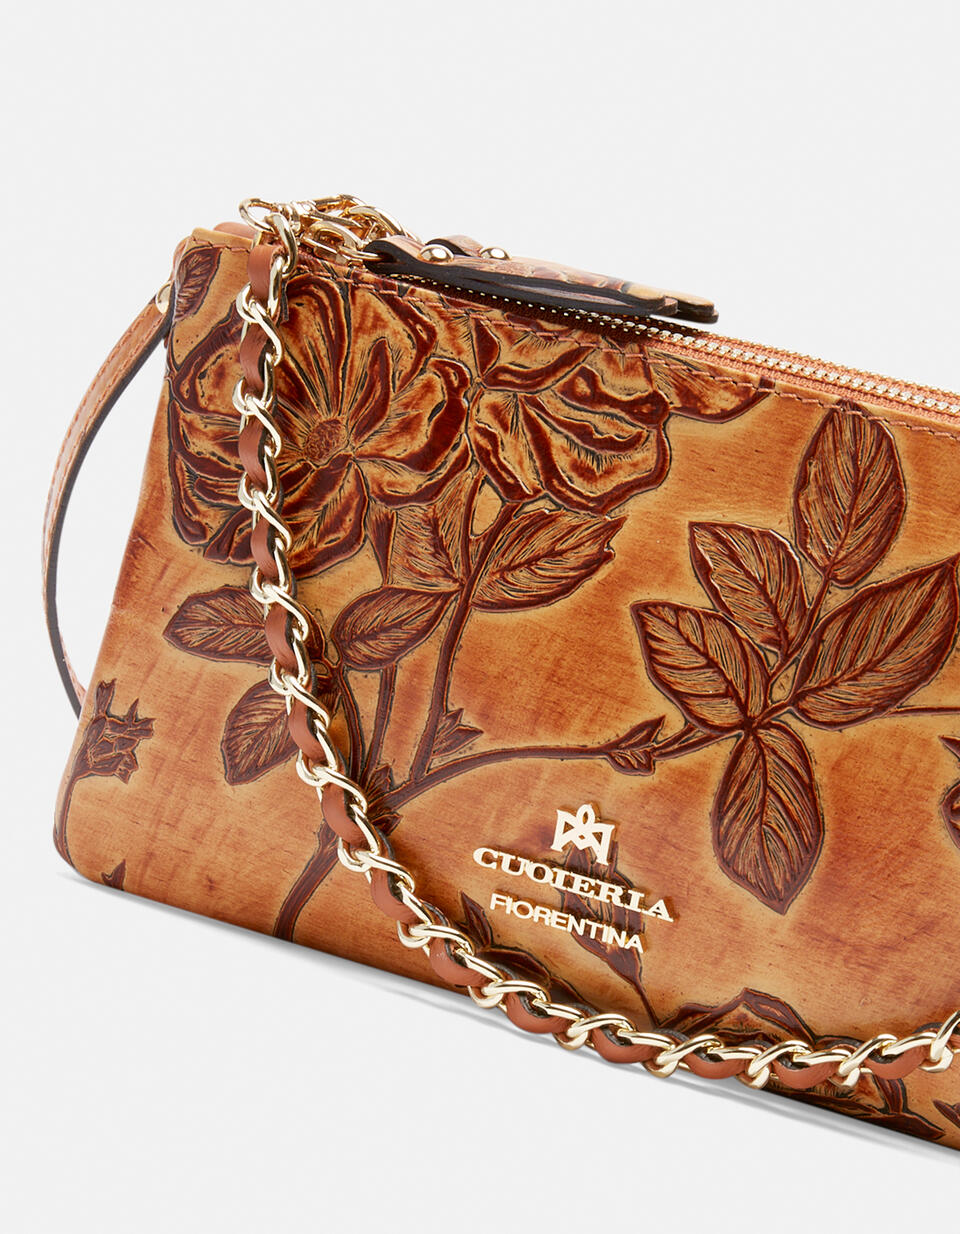 Double clutch bag in rose embossed printed leather Mimì BEIGE Cuoieria Fiorentina